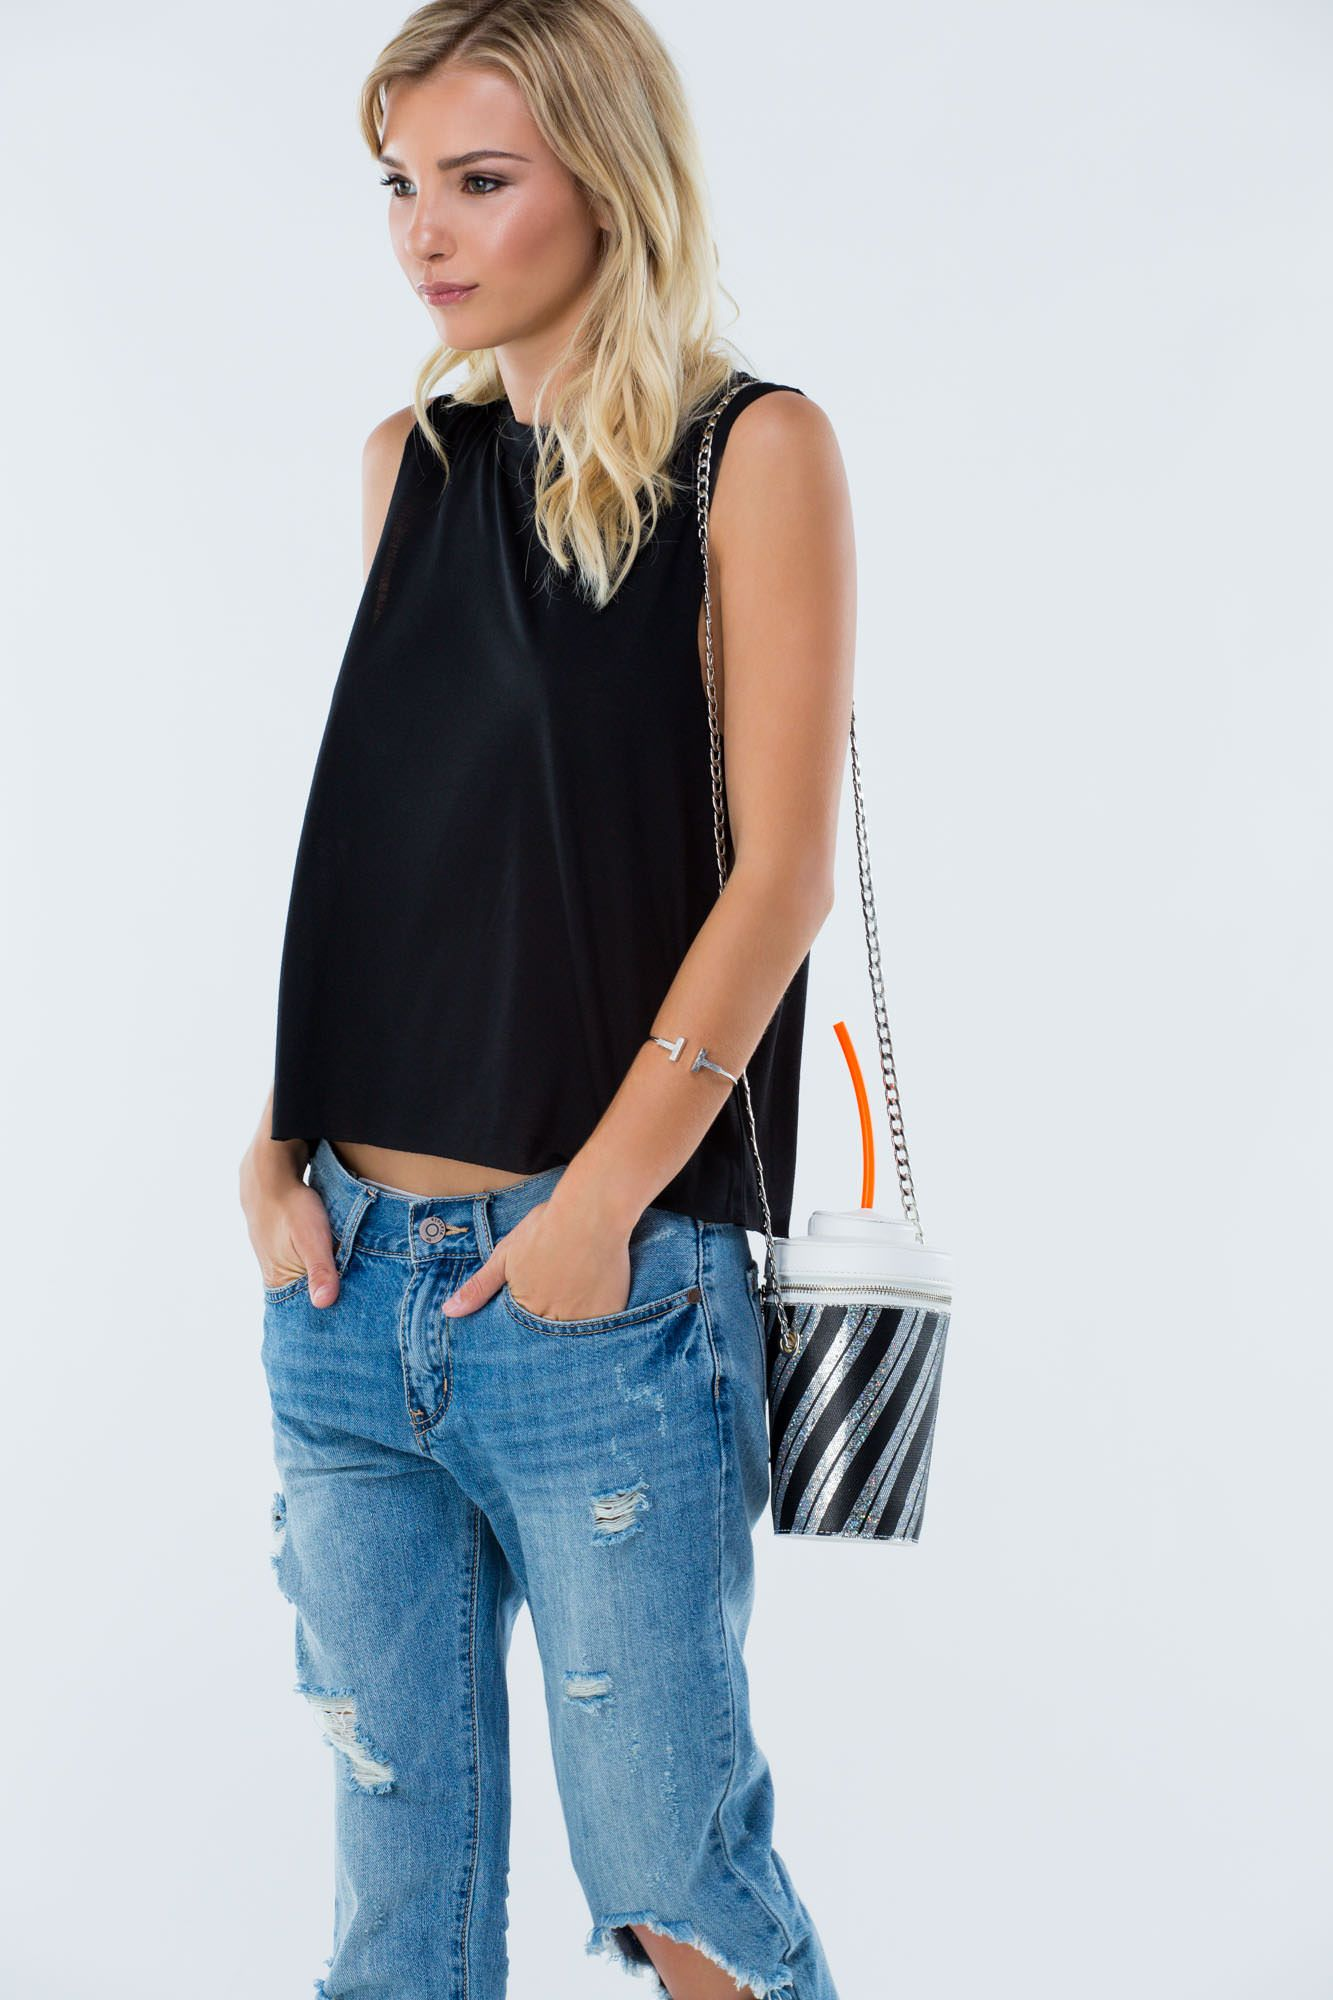 Sippin' Stripes Novelty Cup Bag REDMULTI BLACKMULTI - GoJane.com